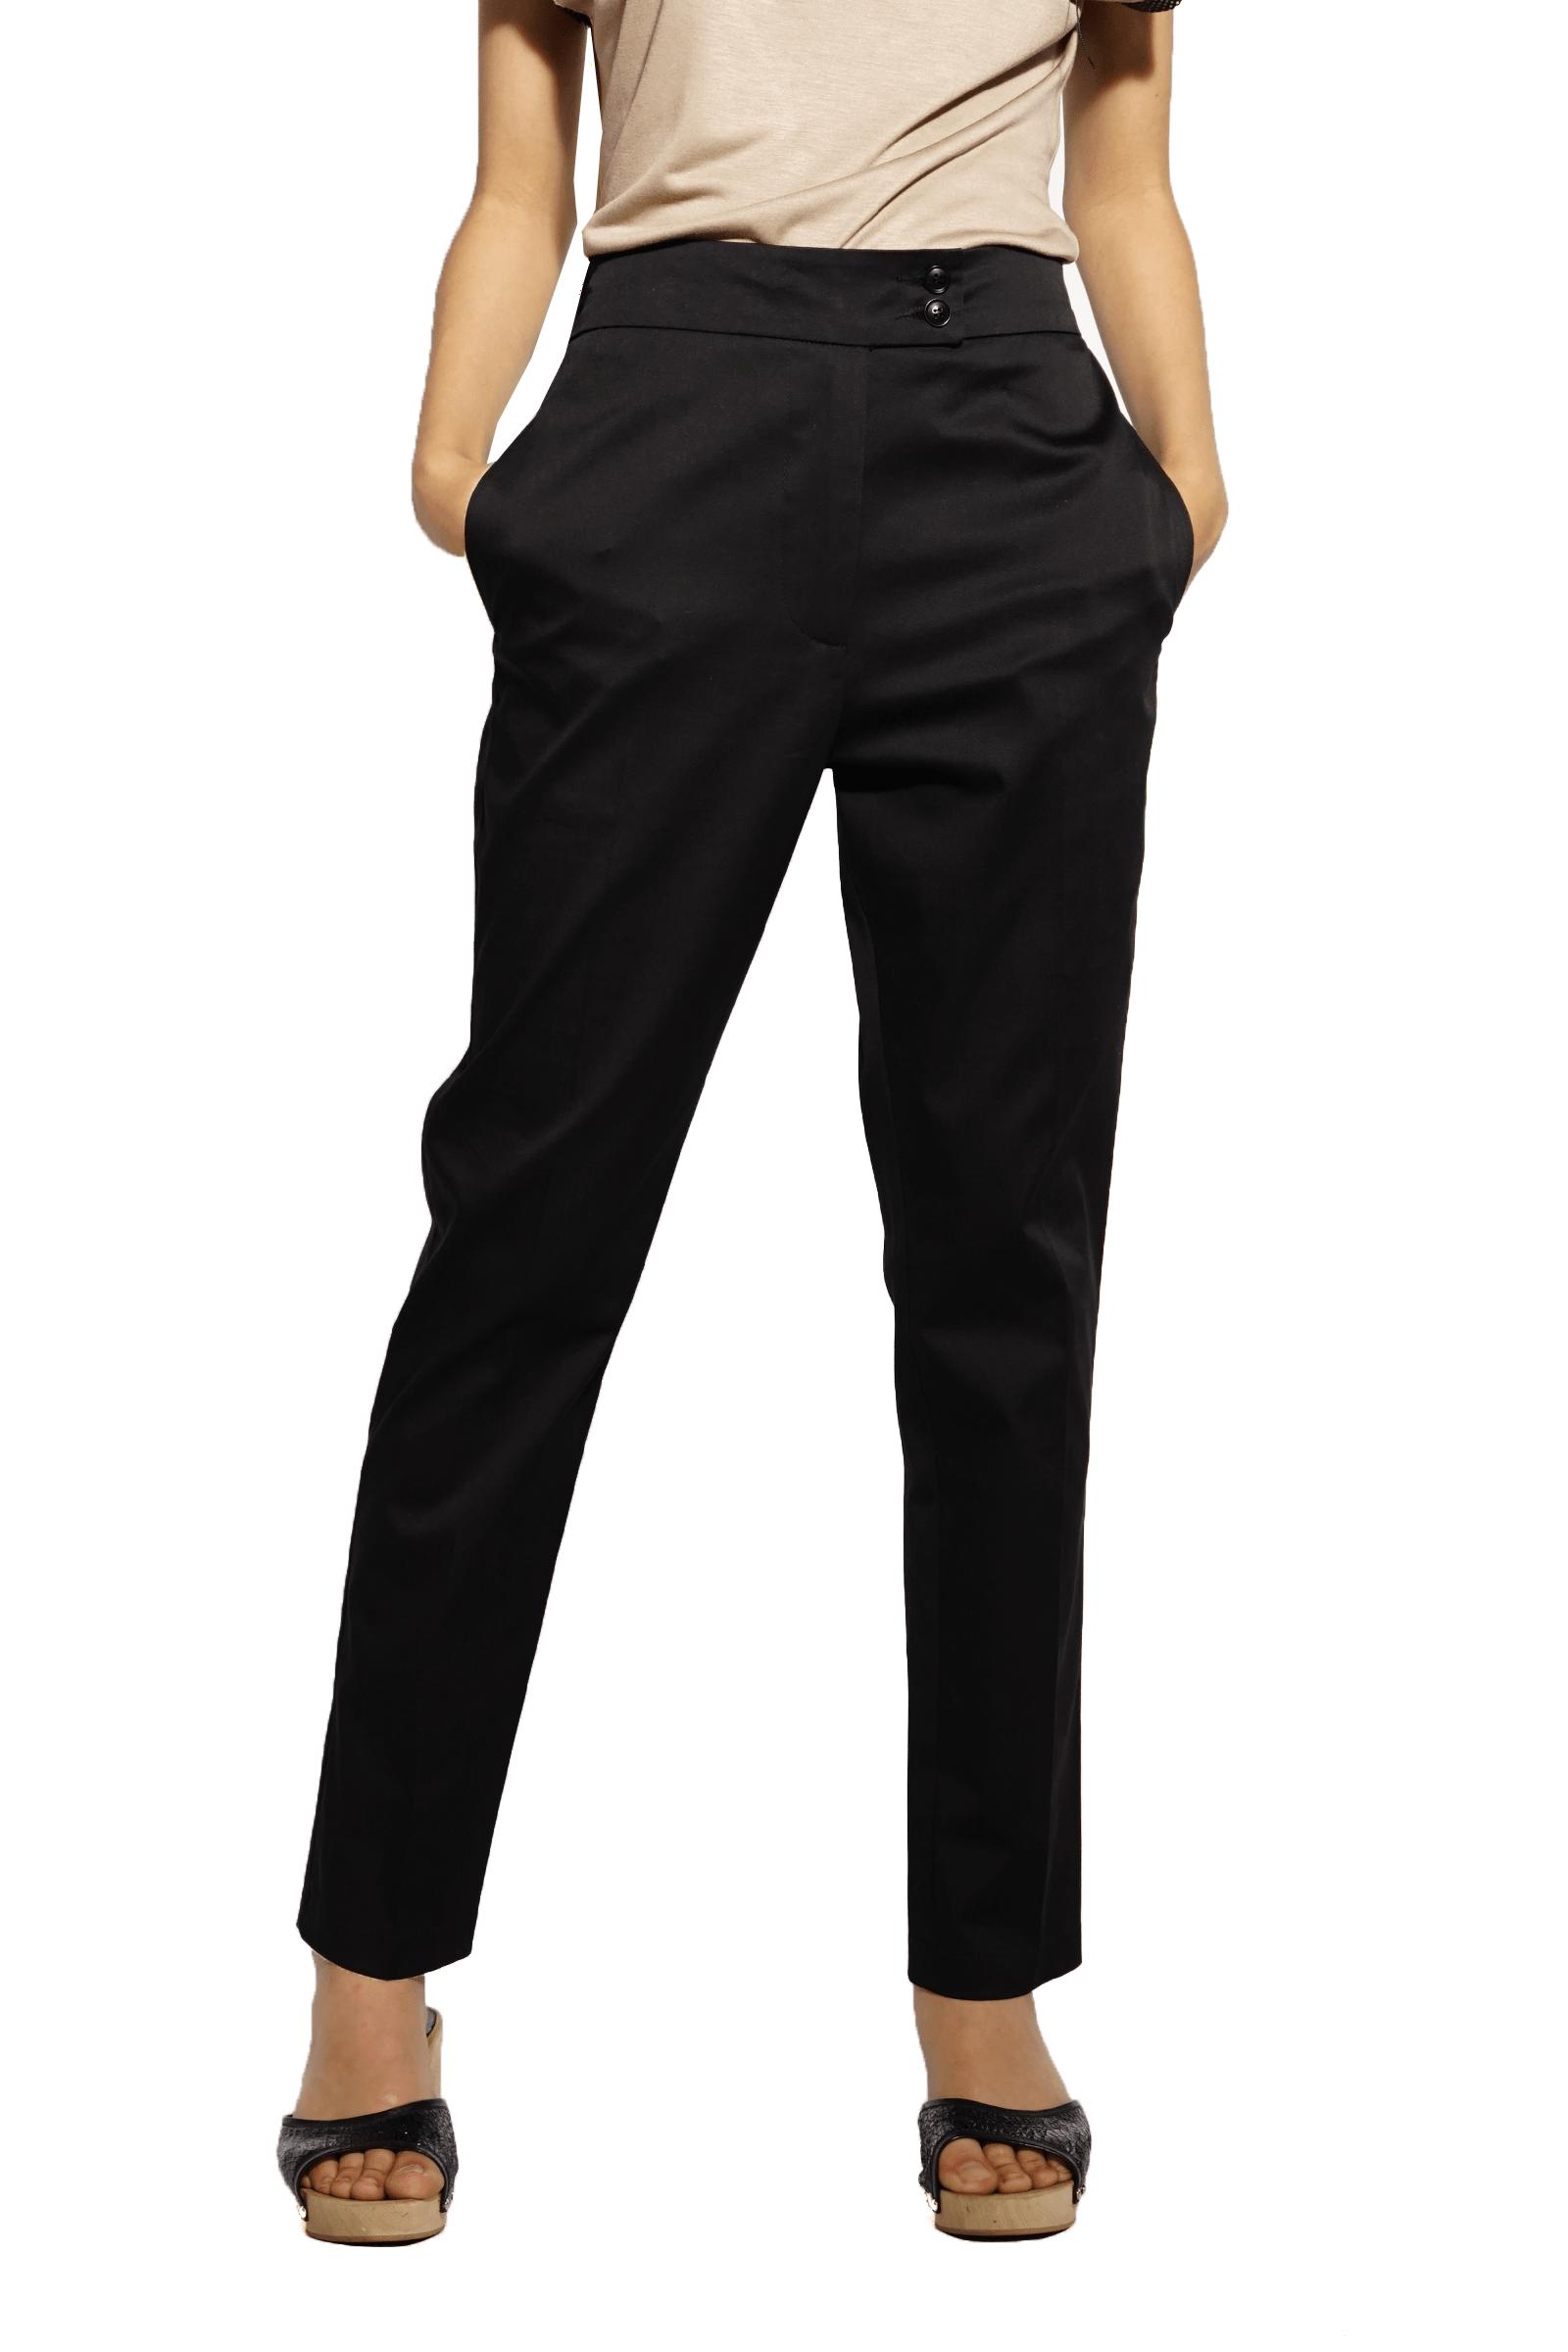 Pantalon negru cu elastic...